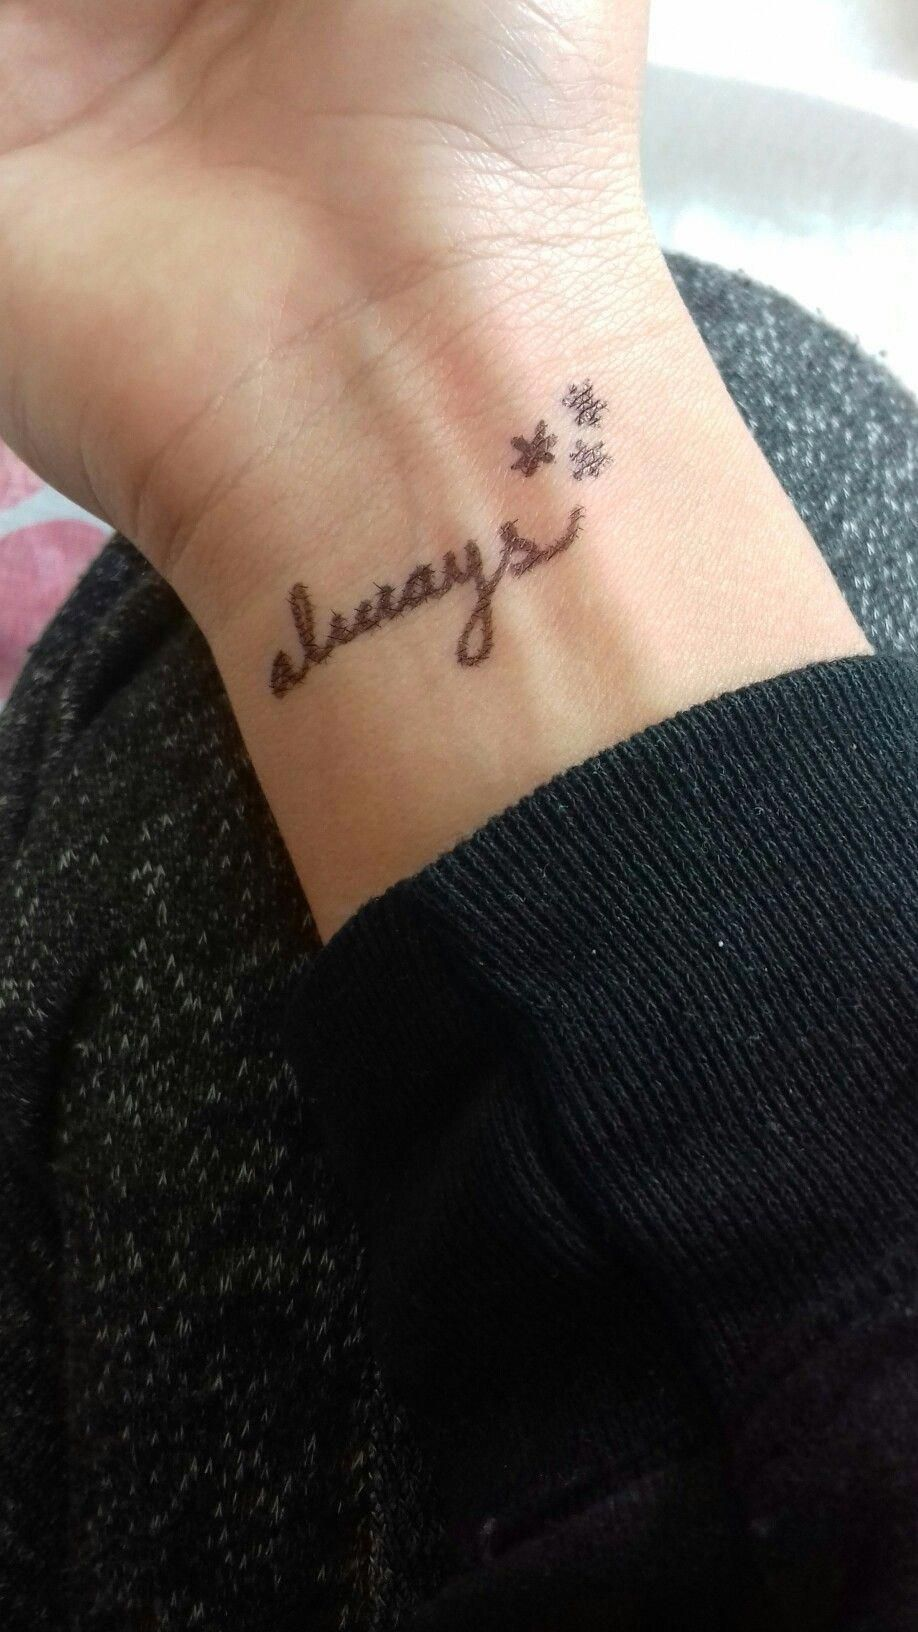 Always Design Harry Potter Harrypottertattoosalways Harry Potter Tattoos Always Harry Potter Tattoo Harry Potter Tattoo Small